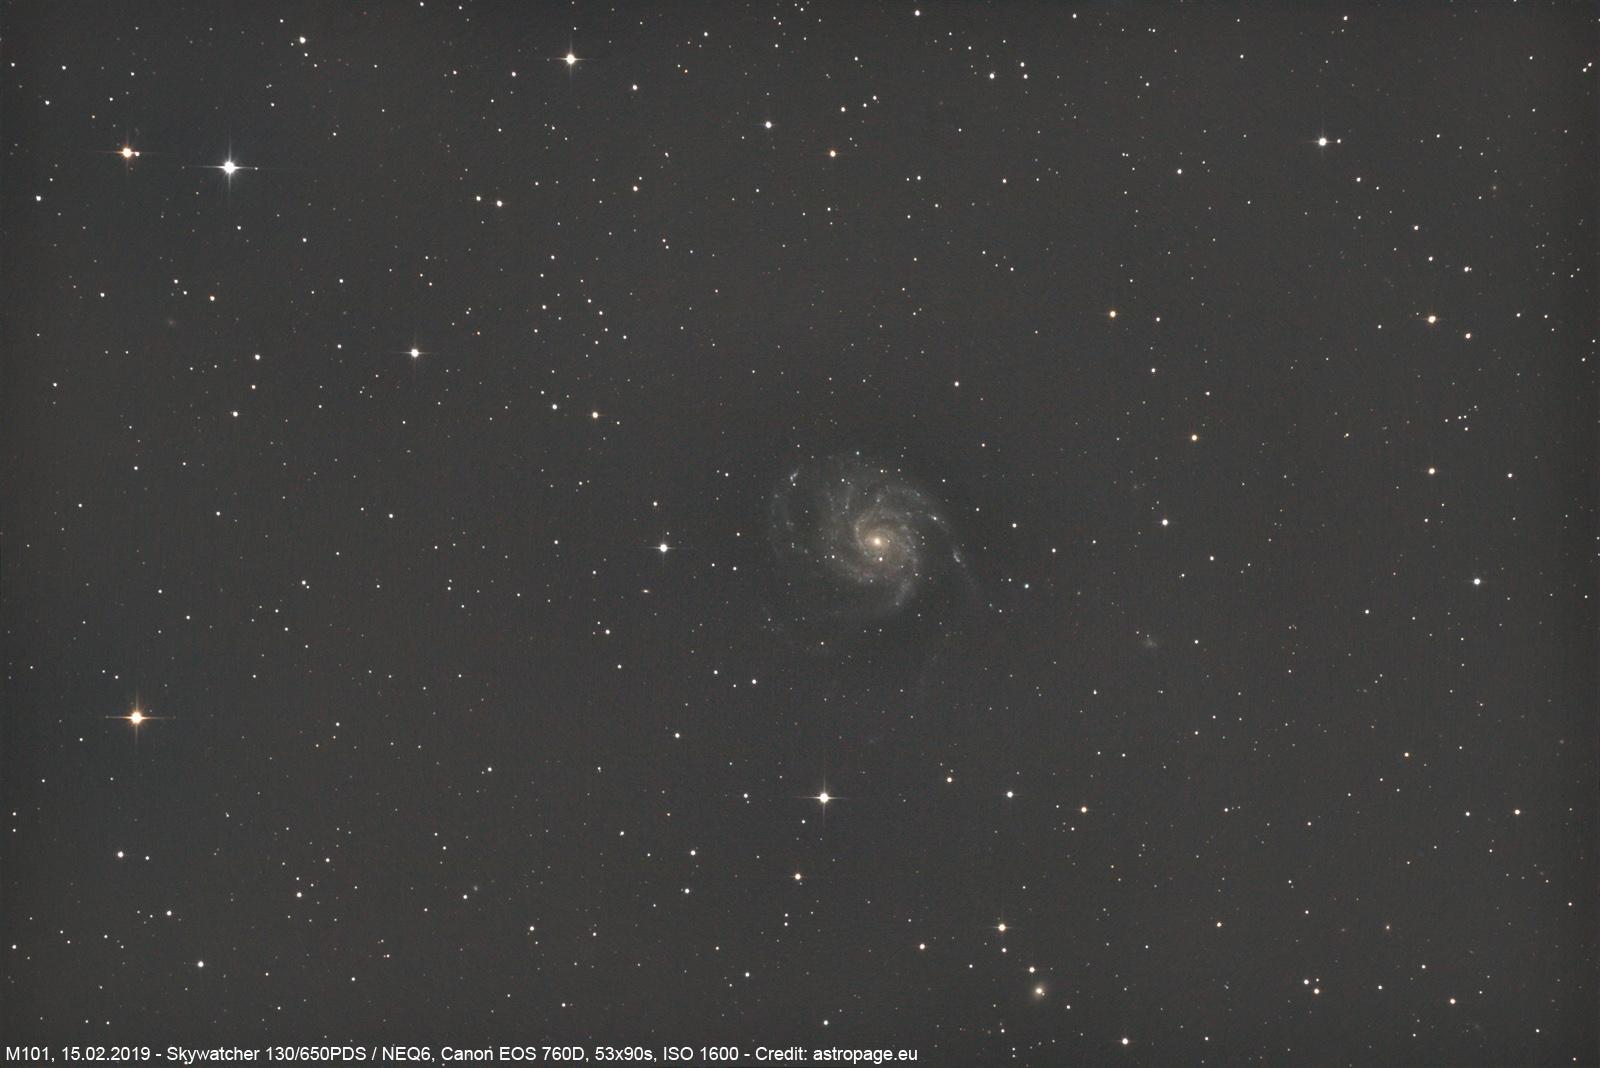 Die Feuerrad-Galaxie M101, 15.02.2019. (Credits: astropage.eu)